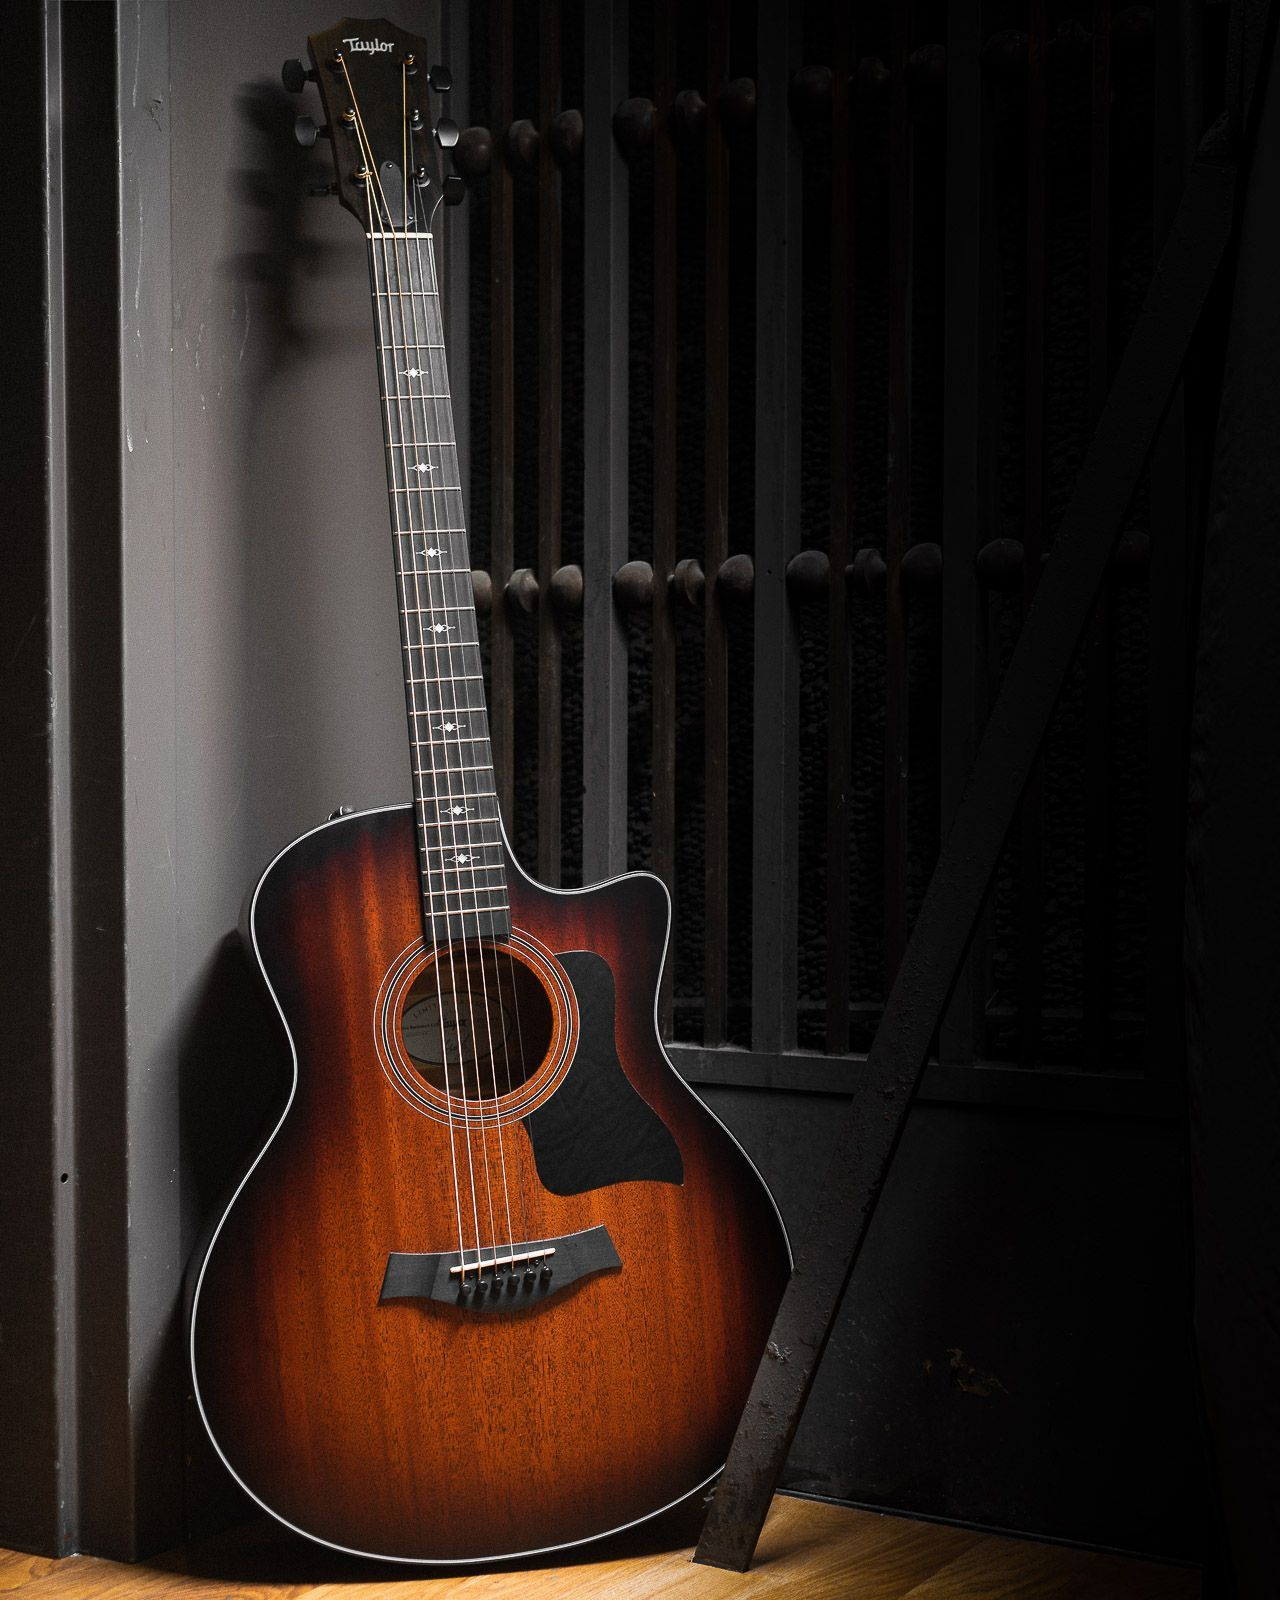 Taylor 326ce Baritone 6 Ltd Tropical Mahogany Blackwood Es2 Baritone Baritone Guitar Blackwood